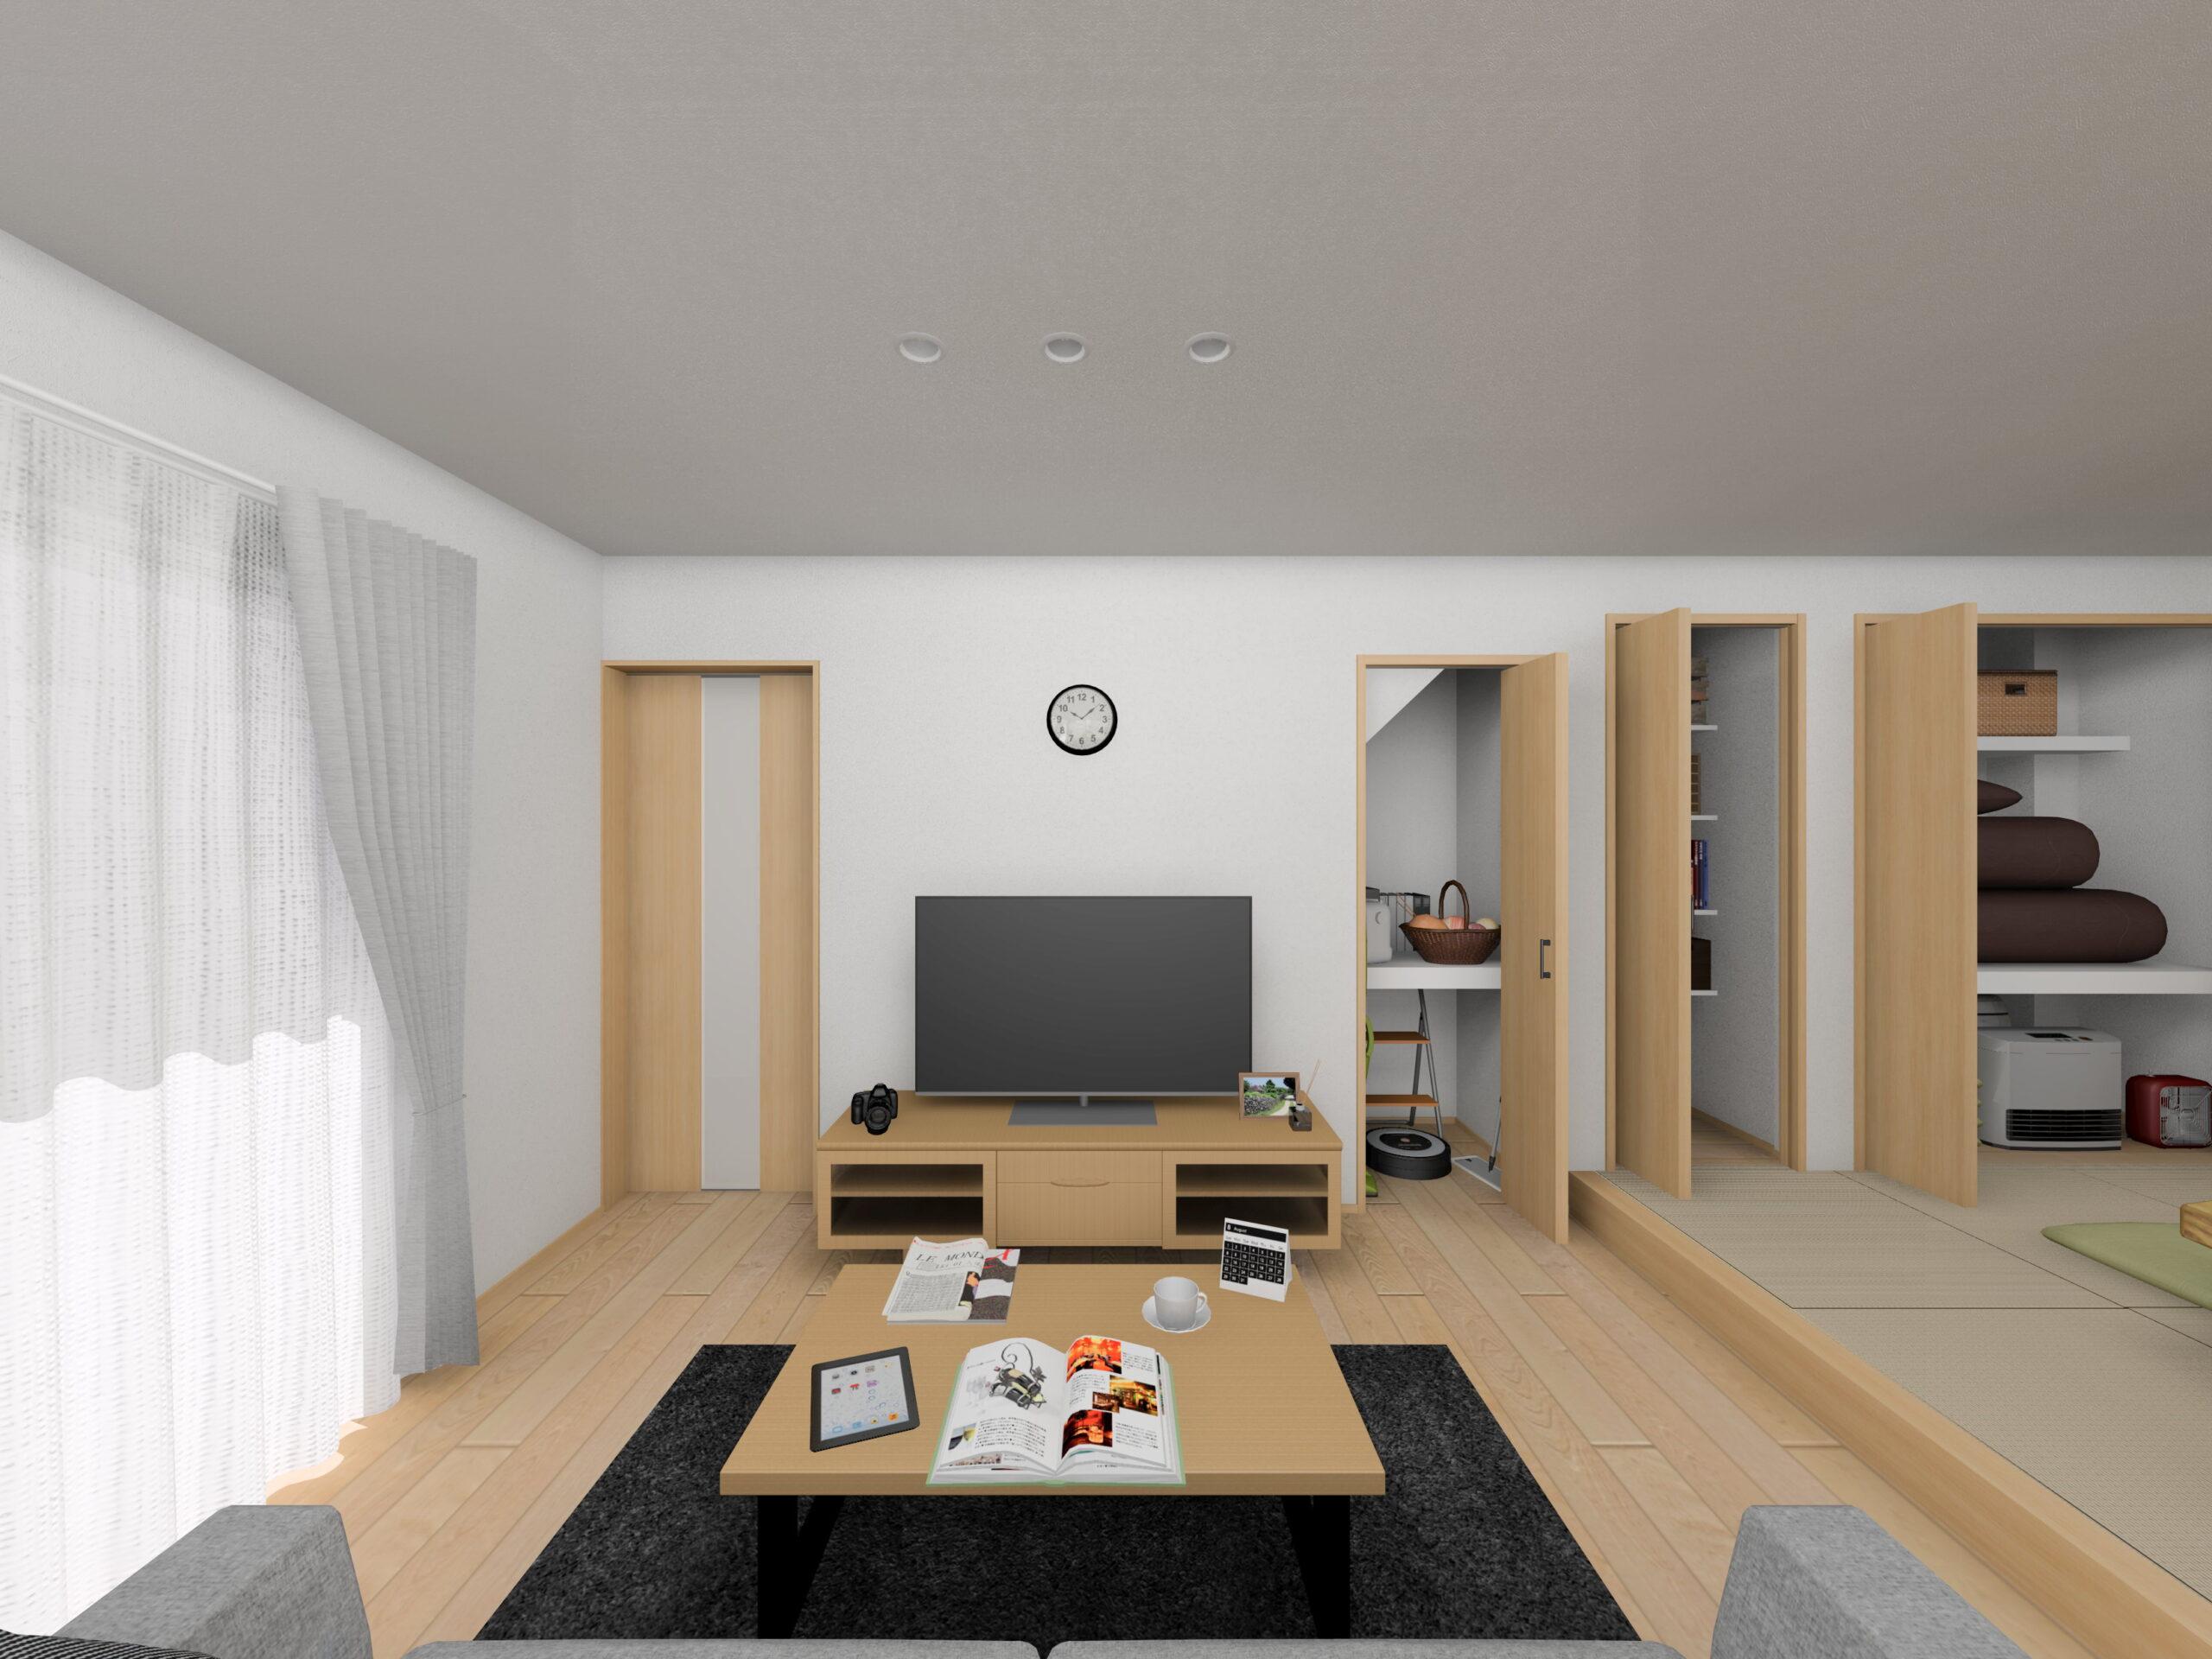 嬉野市新築建売住宅「OURS下野1号地」LDKパース